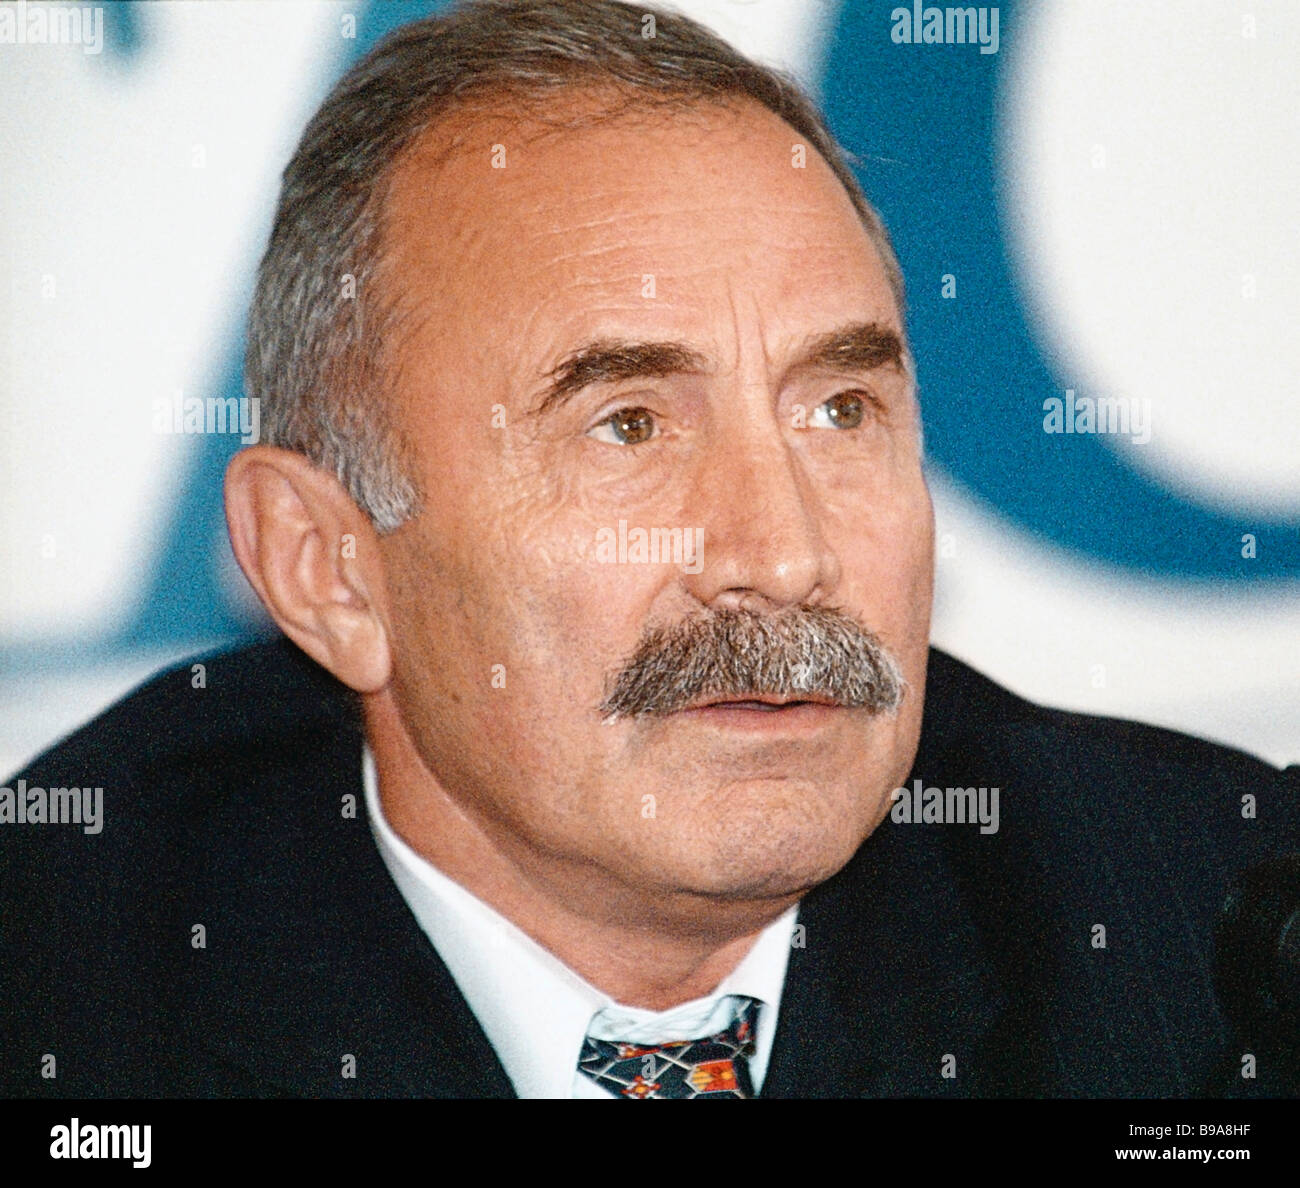 Presidential Adjutant Aslanbek Aslakhanov und Meister des Sports in Sambo während einer Pressekonferenz, wo Stockbild